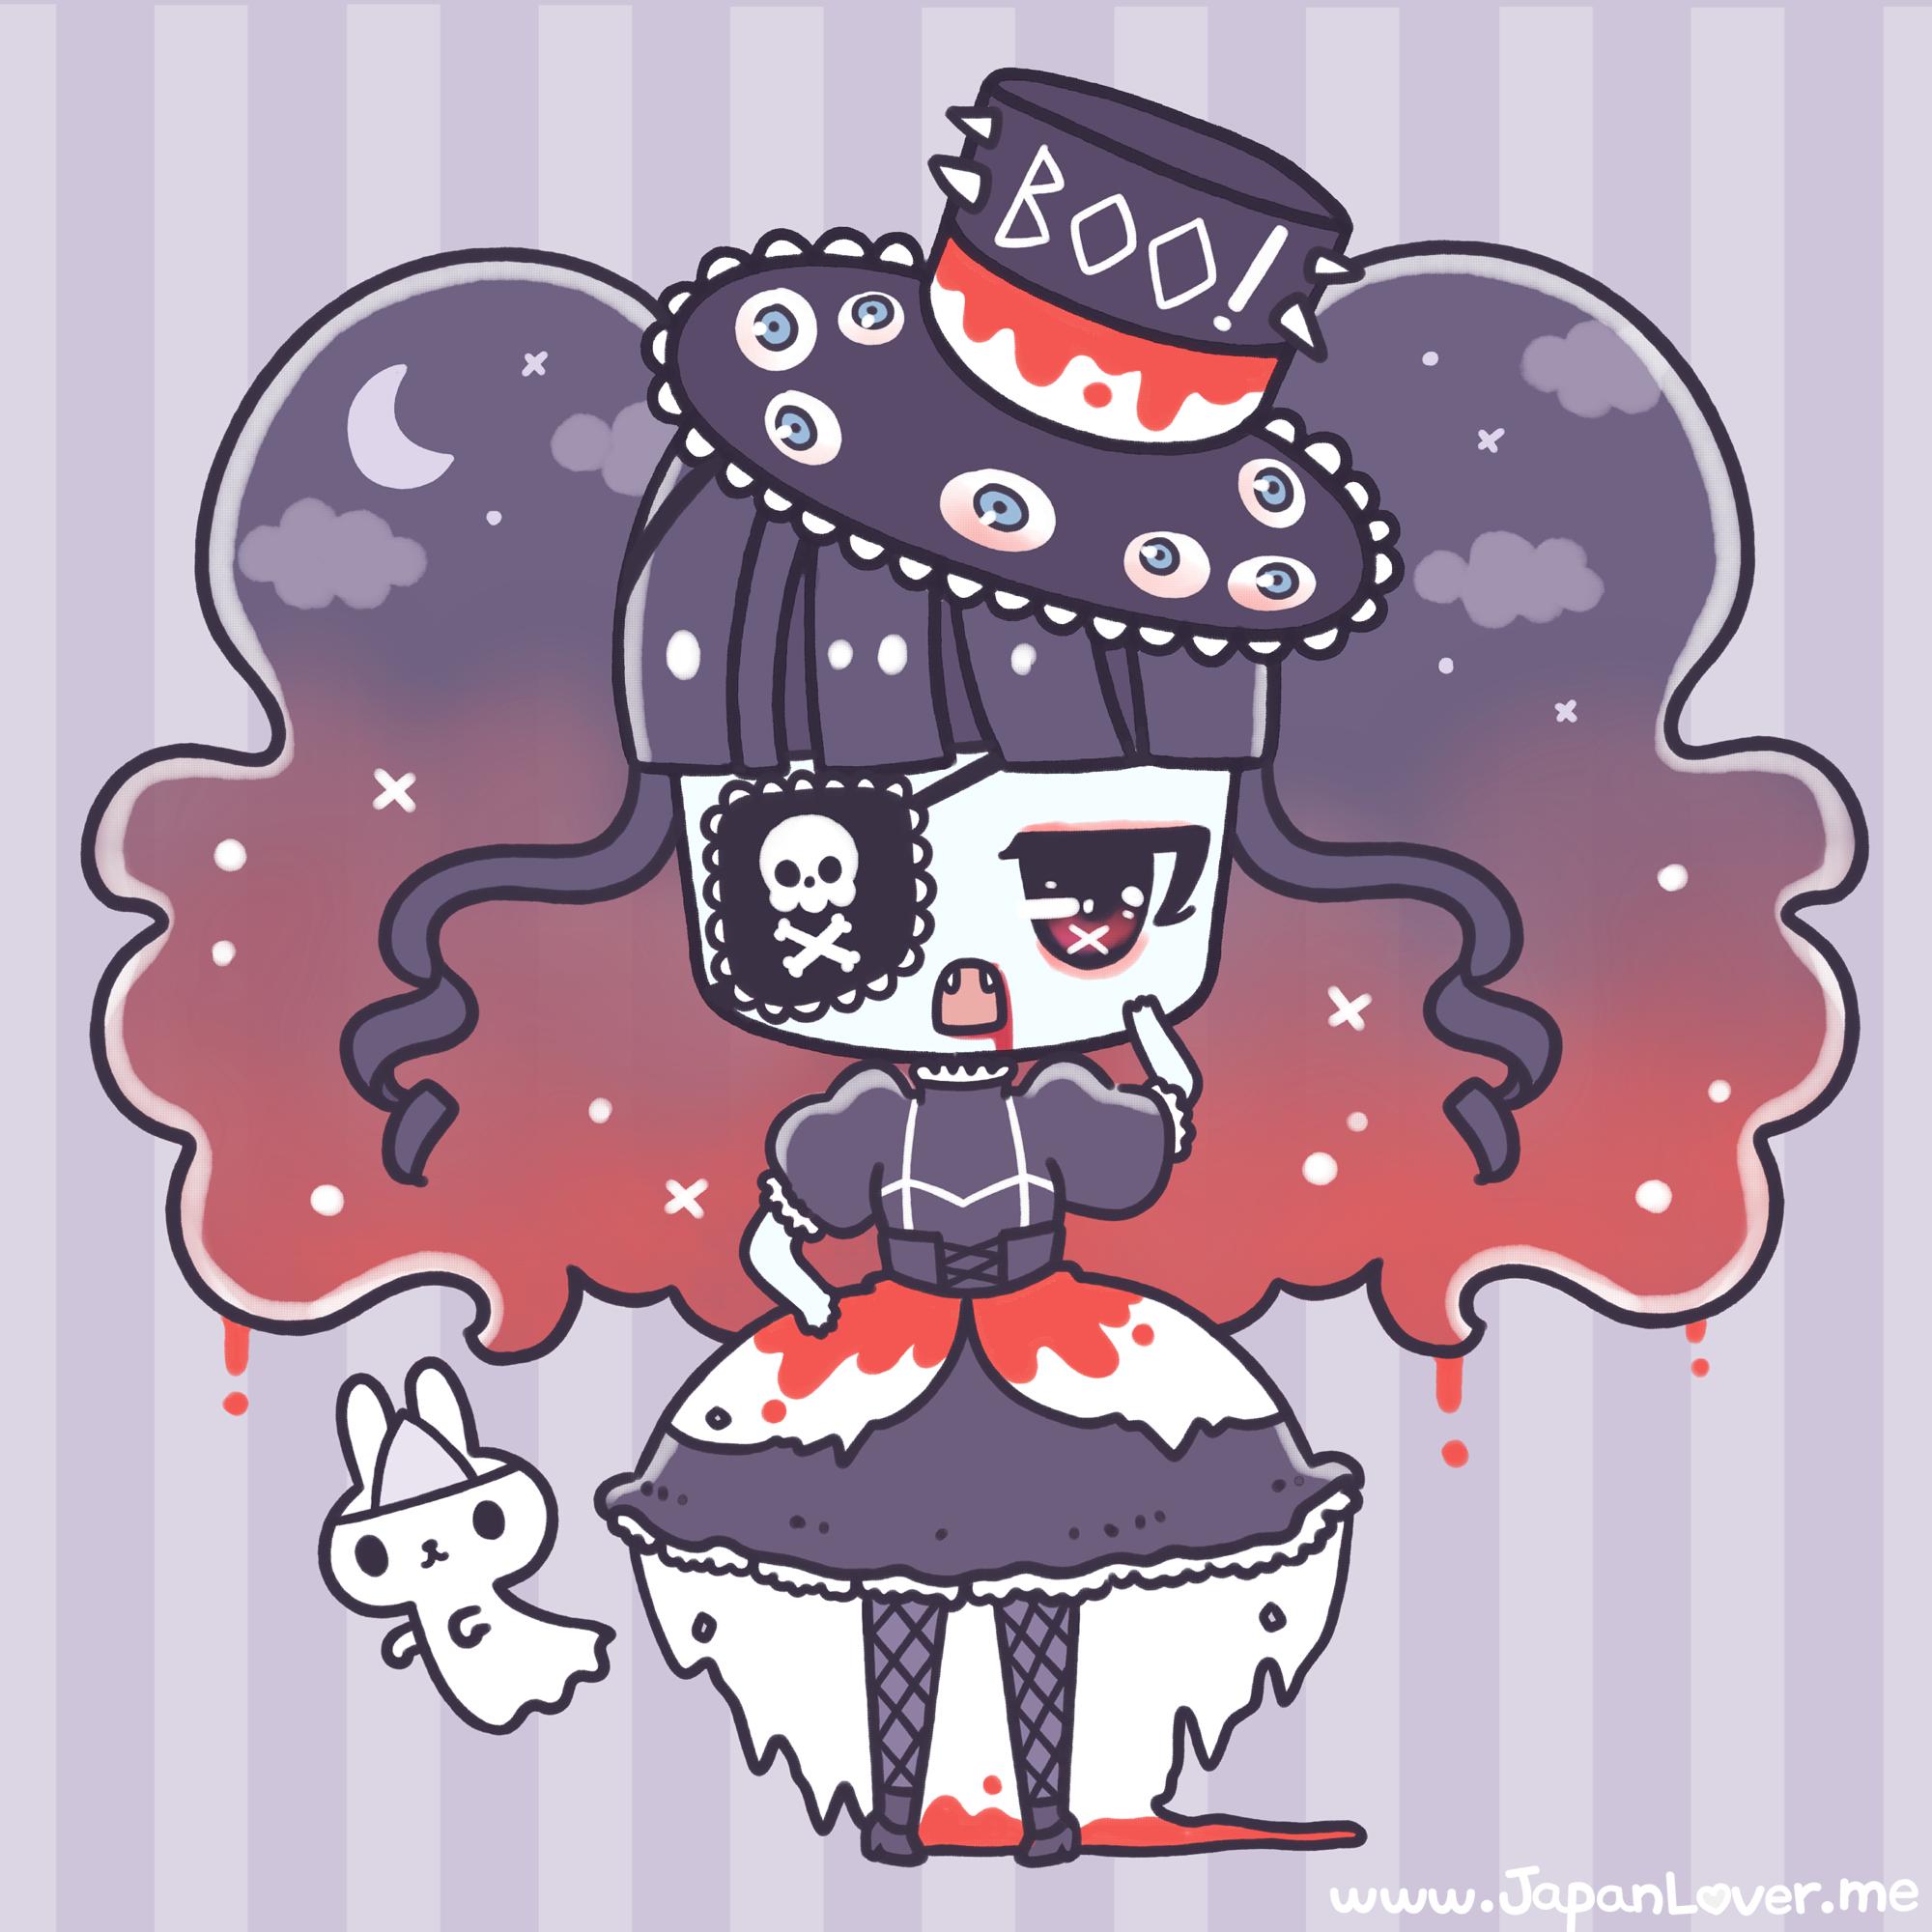 Hello Kawaii / Cool & Otaku JapanLovers! (︶ω︶) Halloween